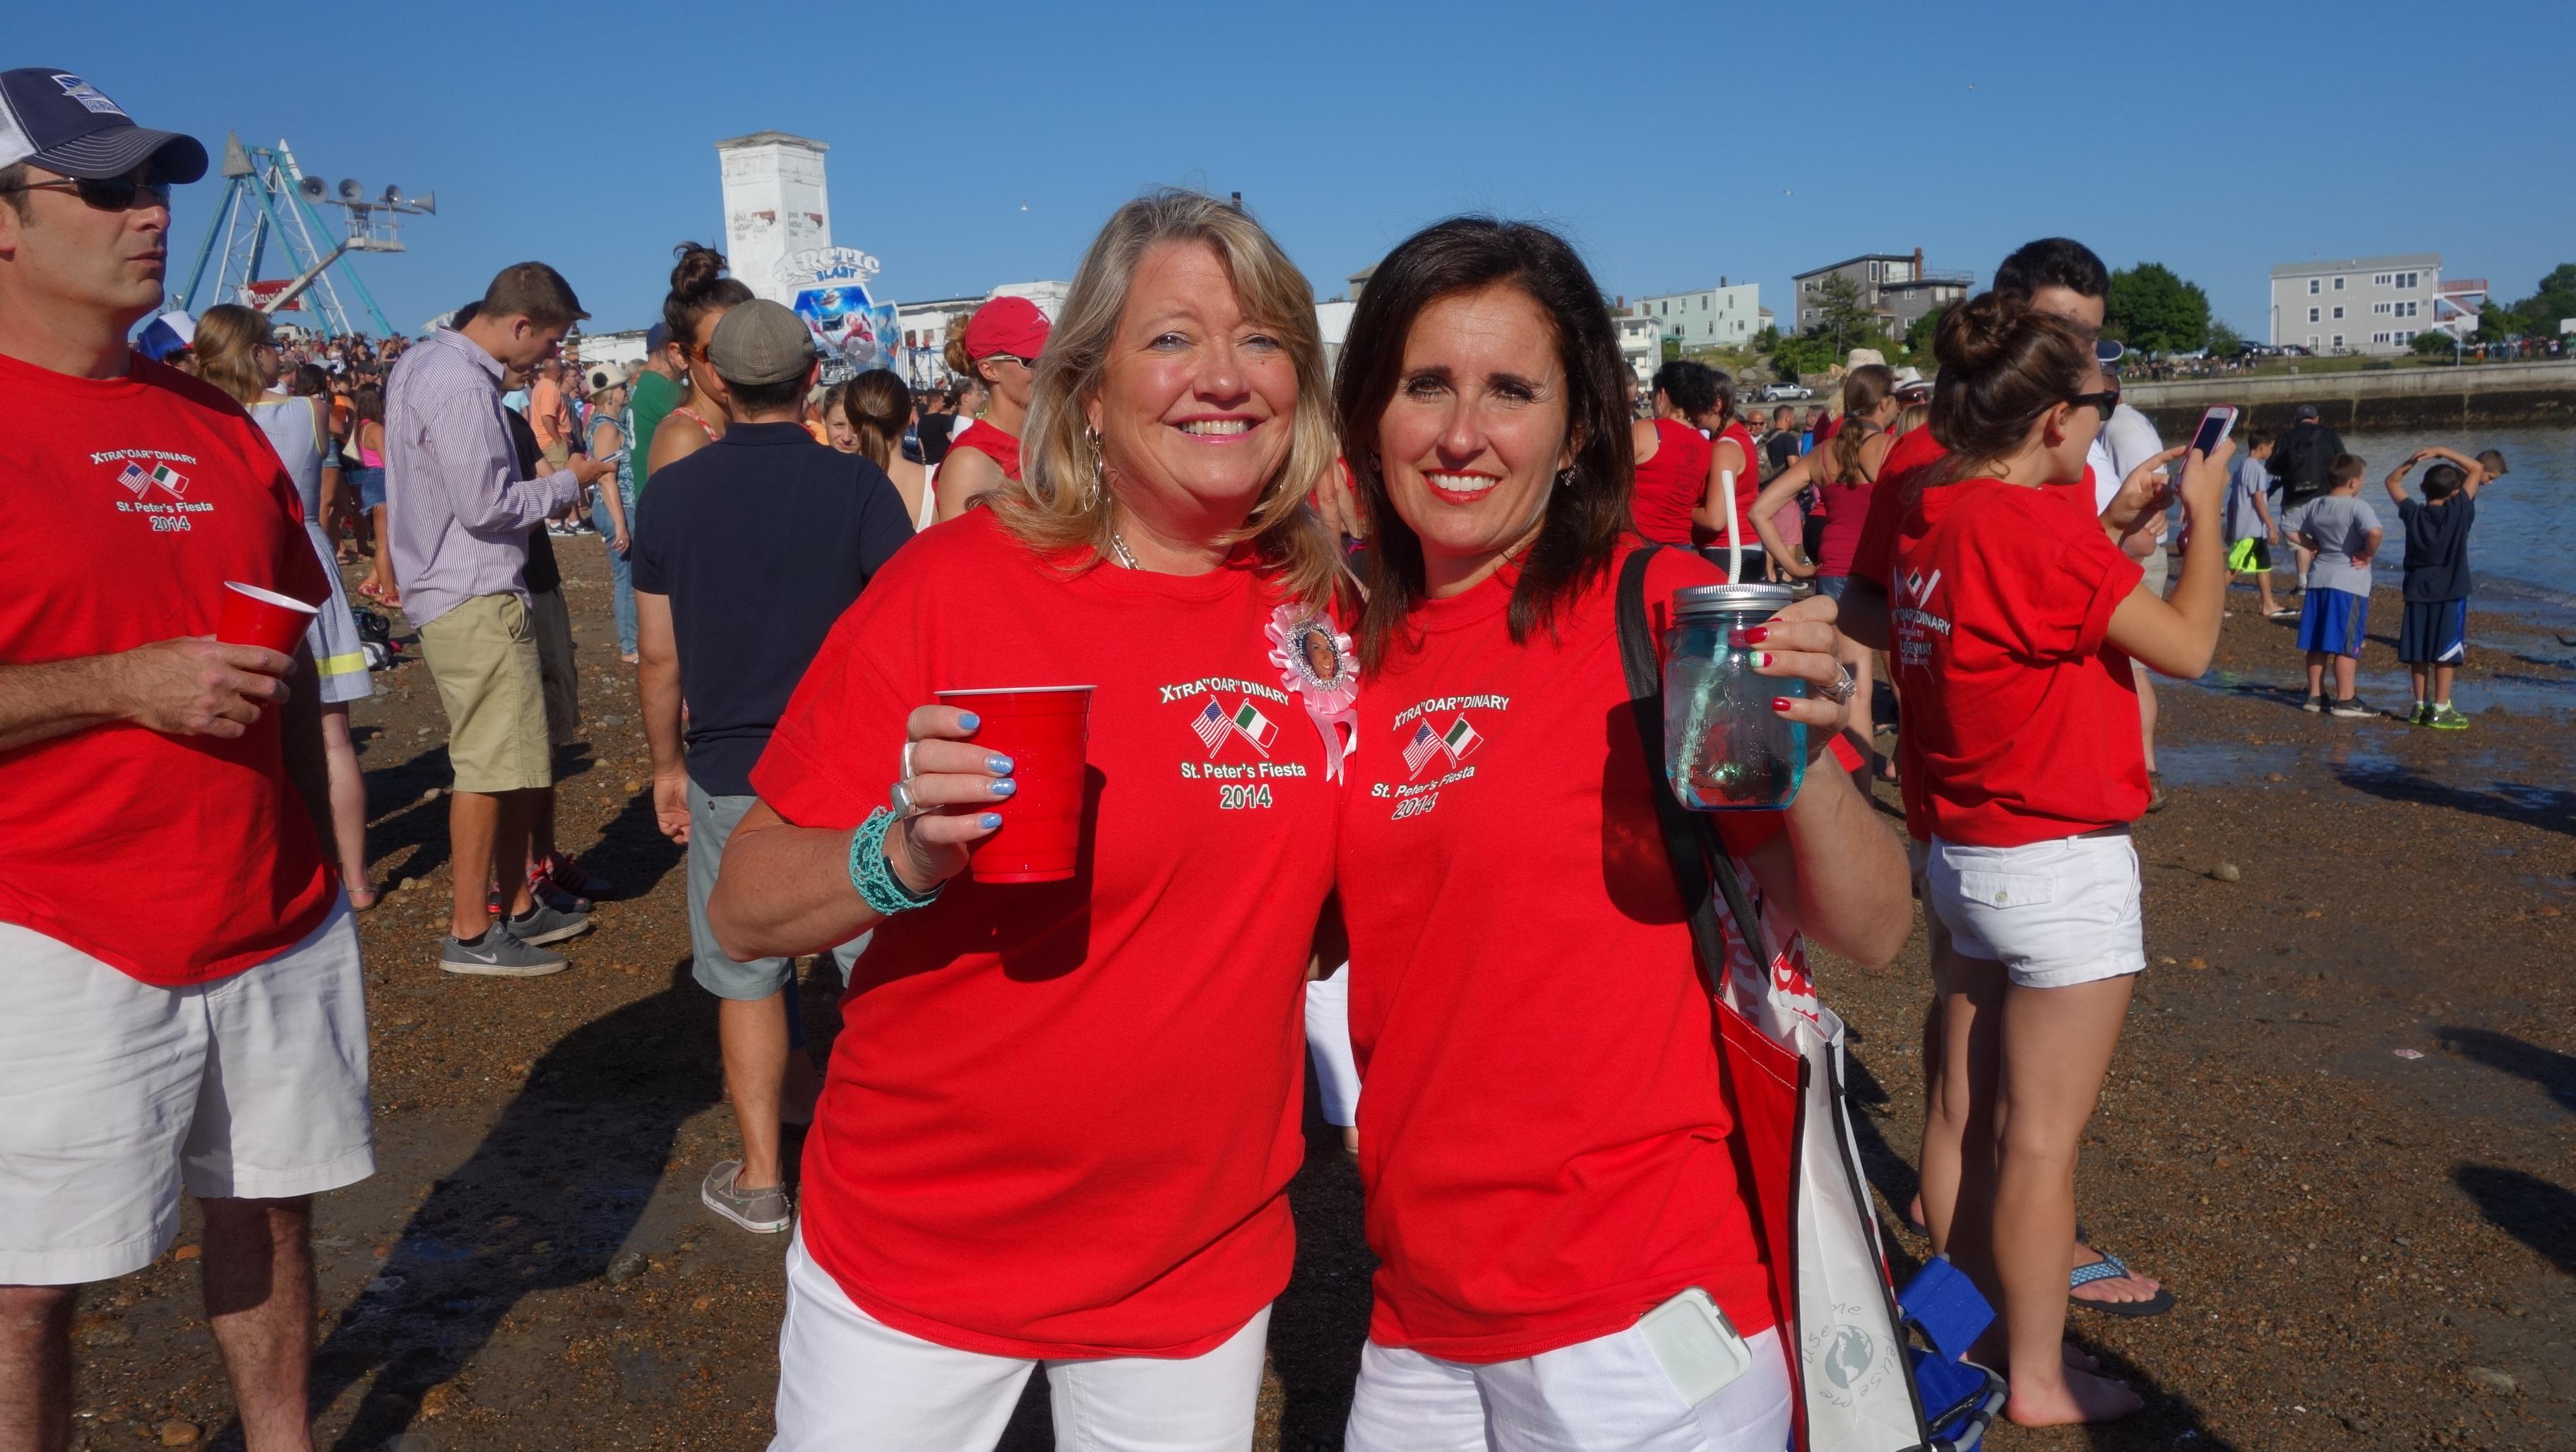 Amanda Race St. Peter's Fiesta 2014 Camps! 166